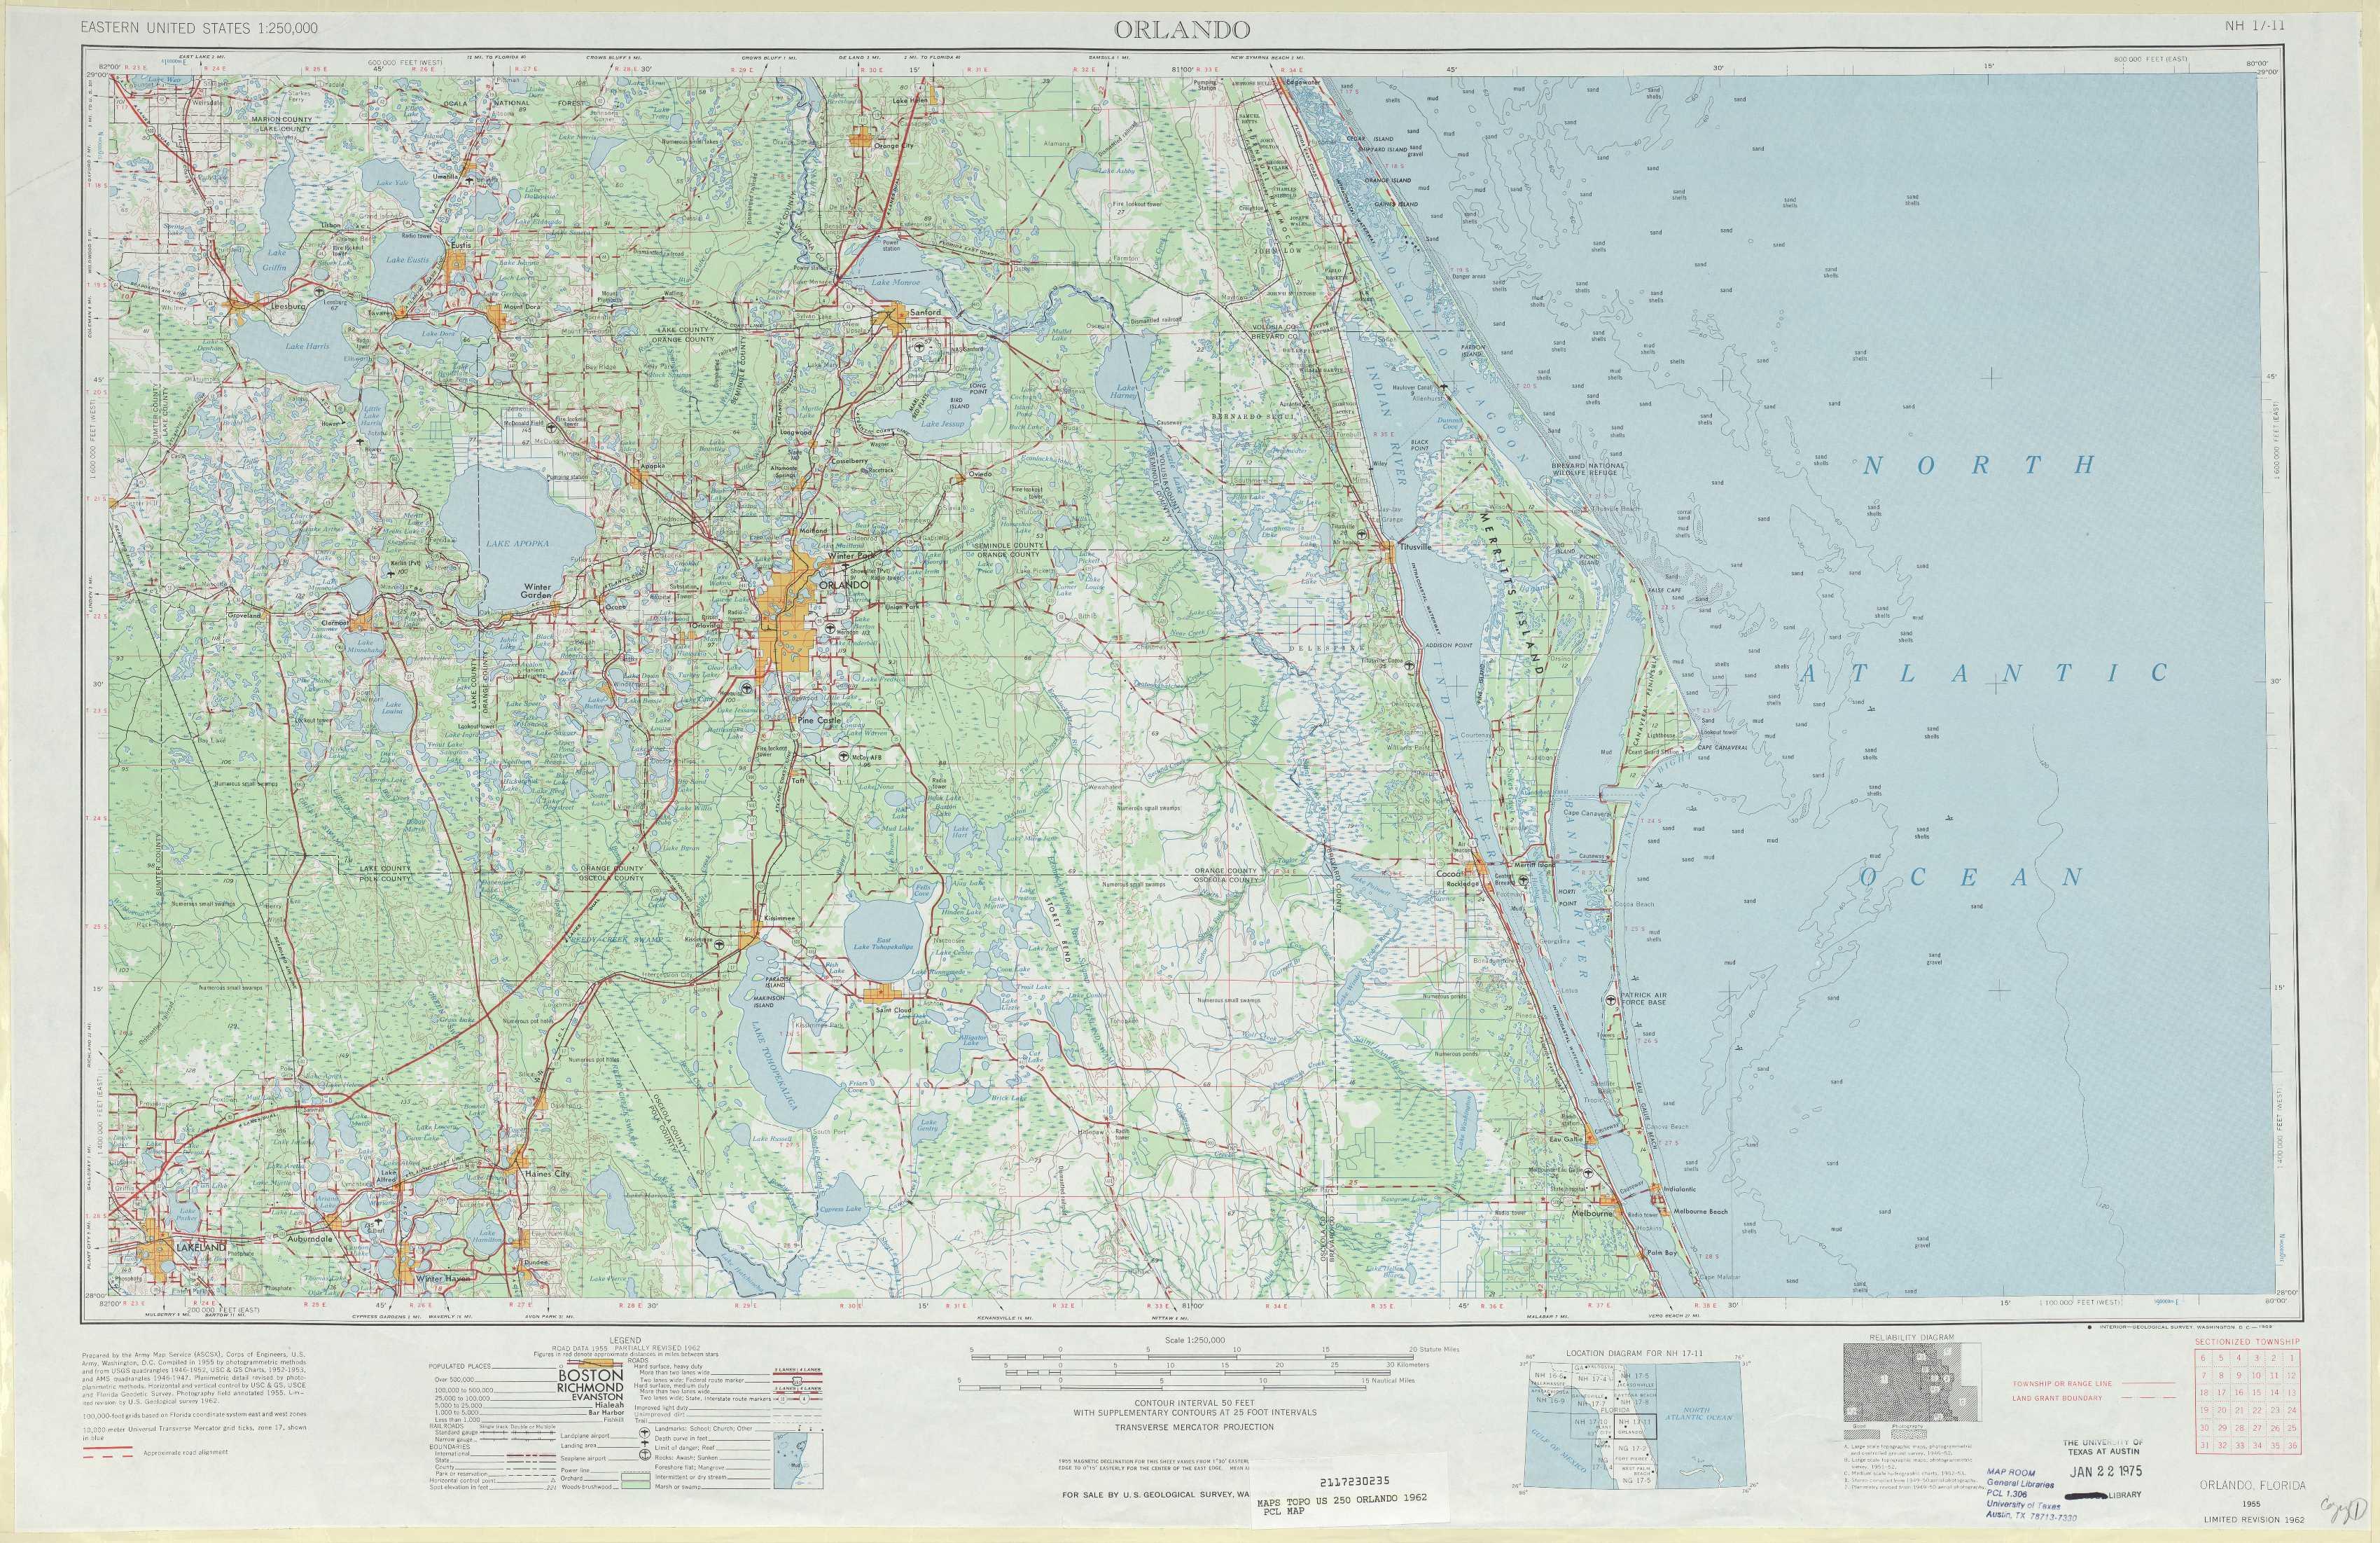 Orlando Topographic Maps, Fl - Usgs Topo Quad 28080A1 At 1:250,000 Scale - South Florida Topographic Map